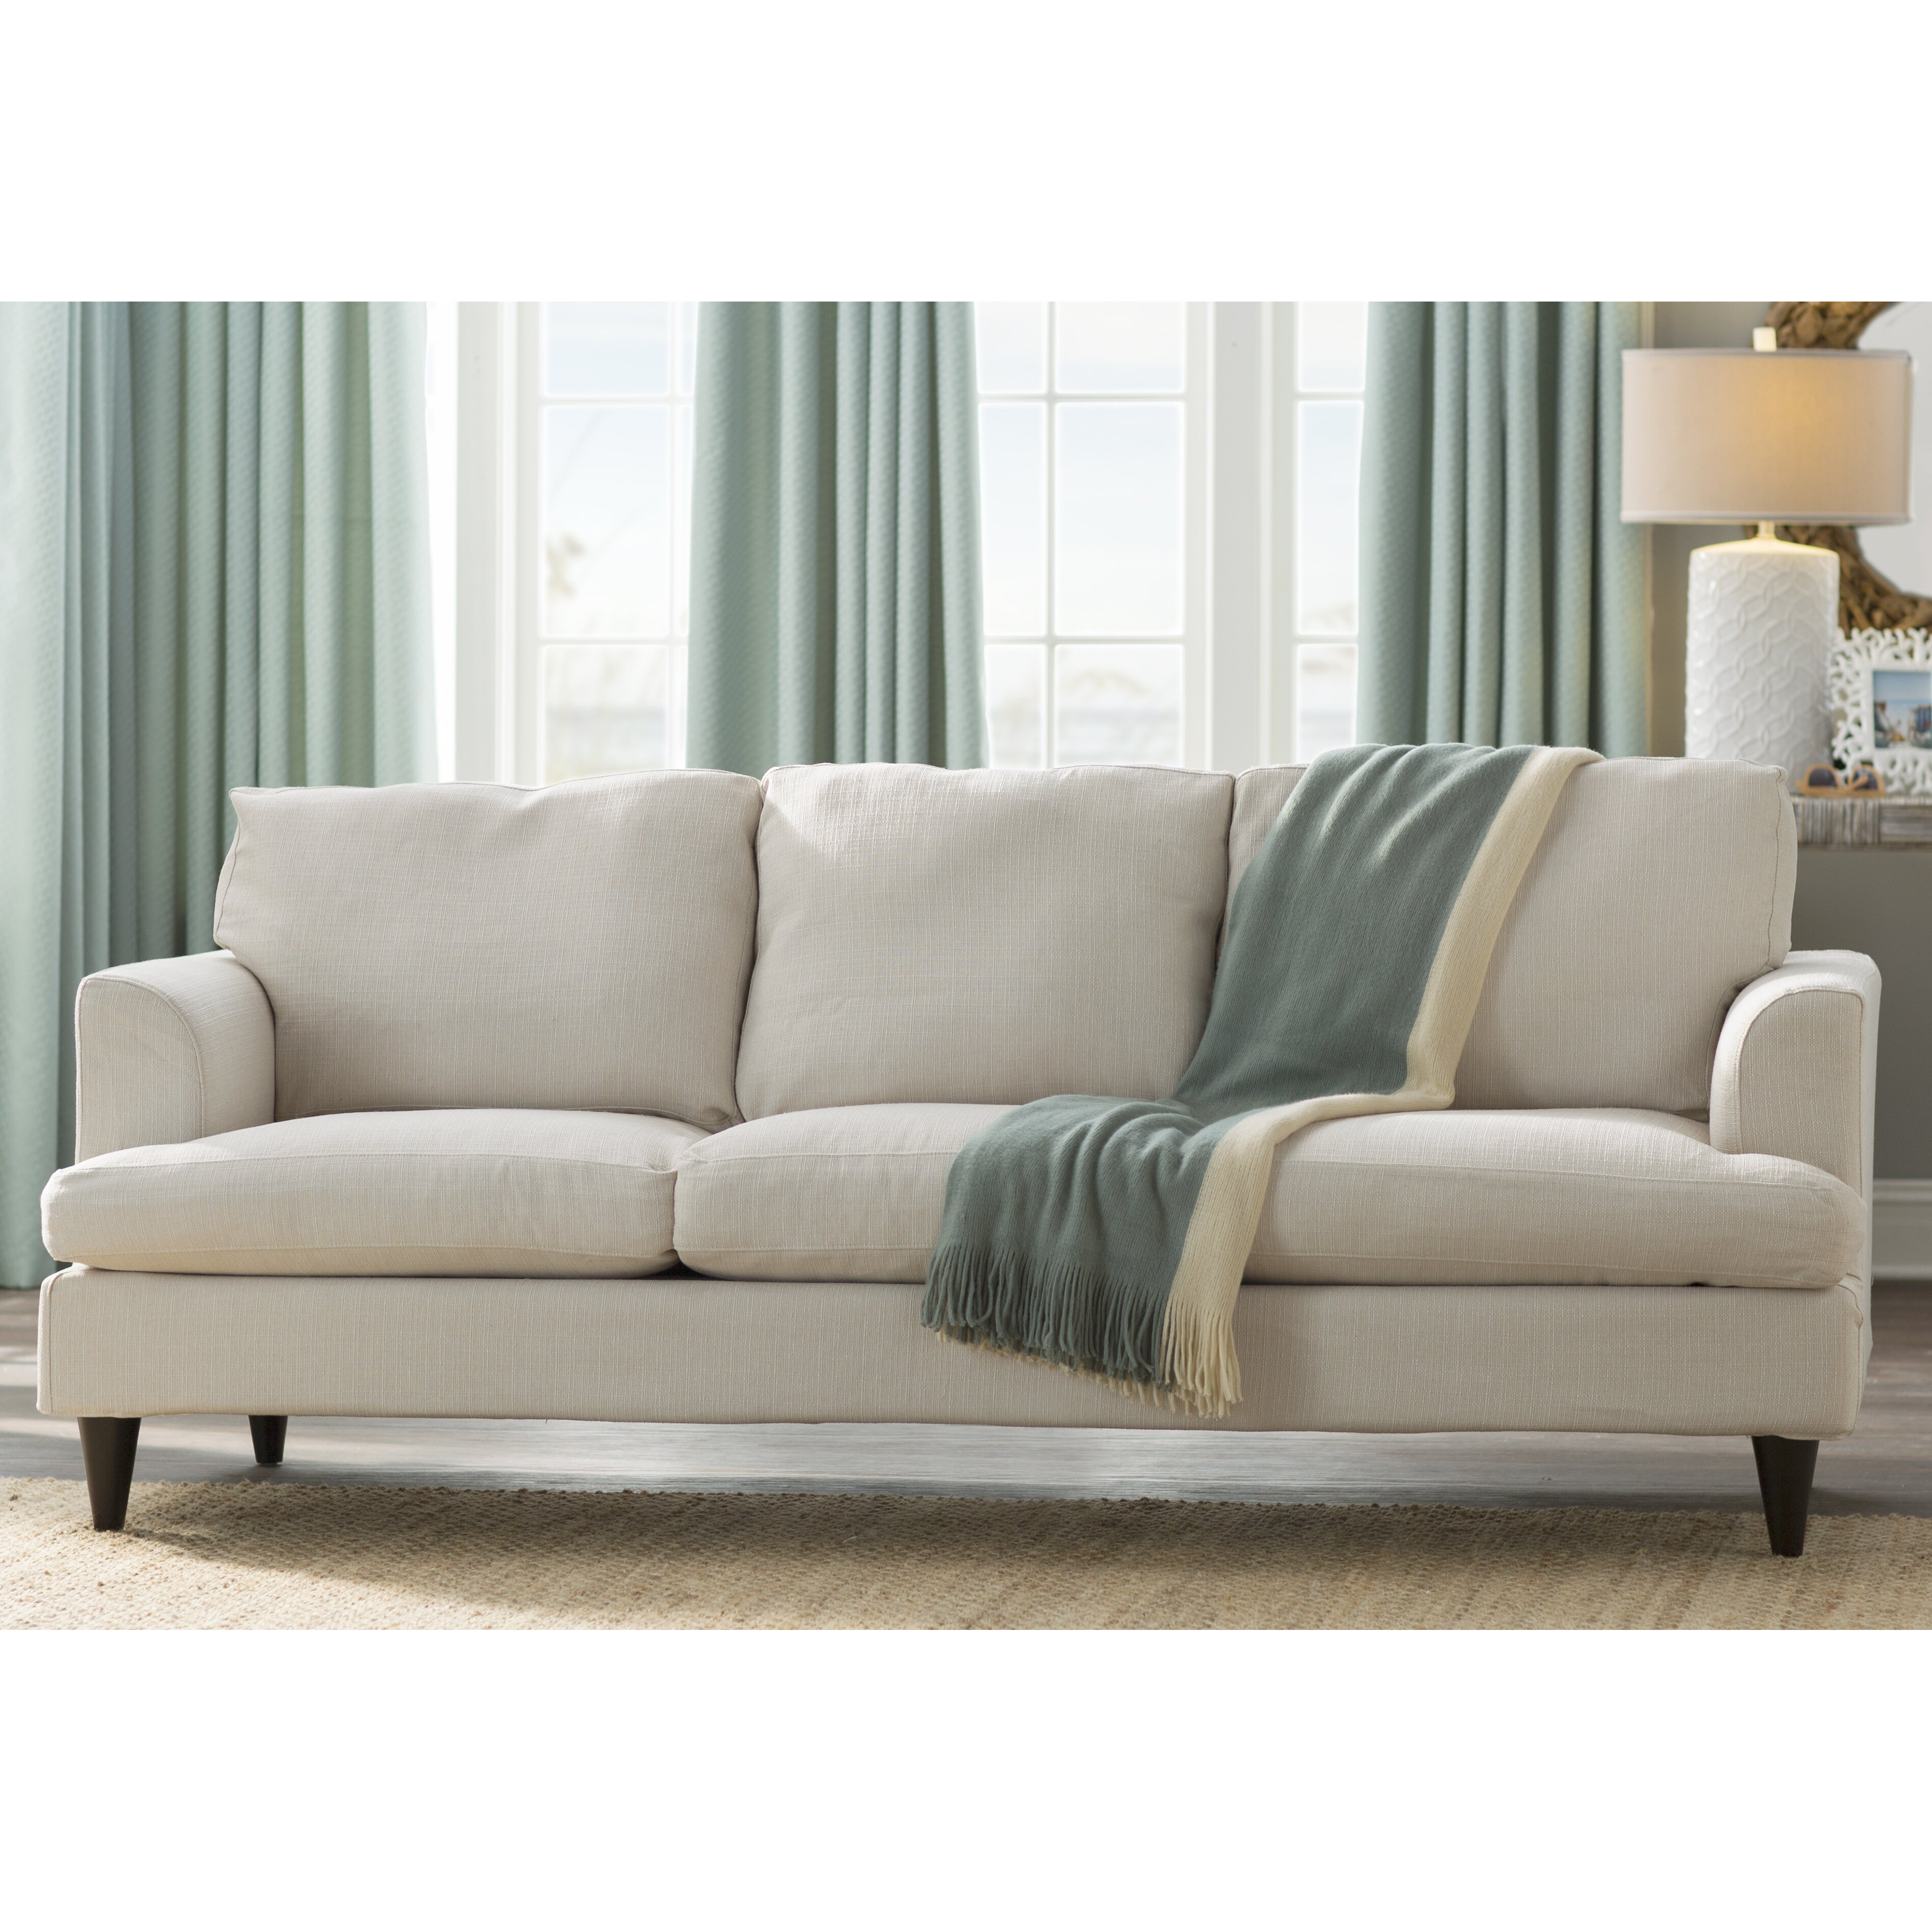 Lowes Living Room Furniture